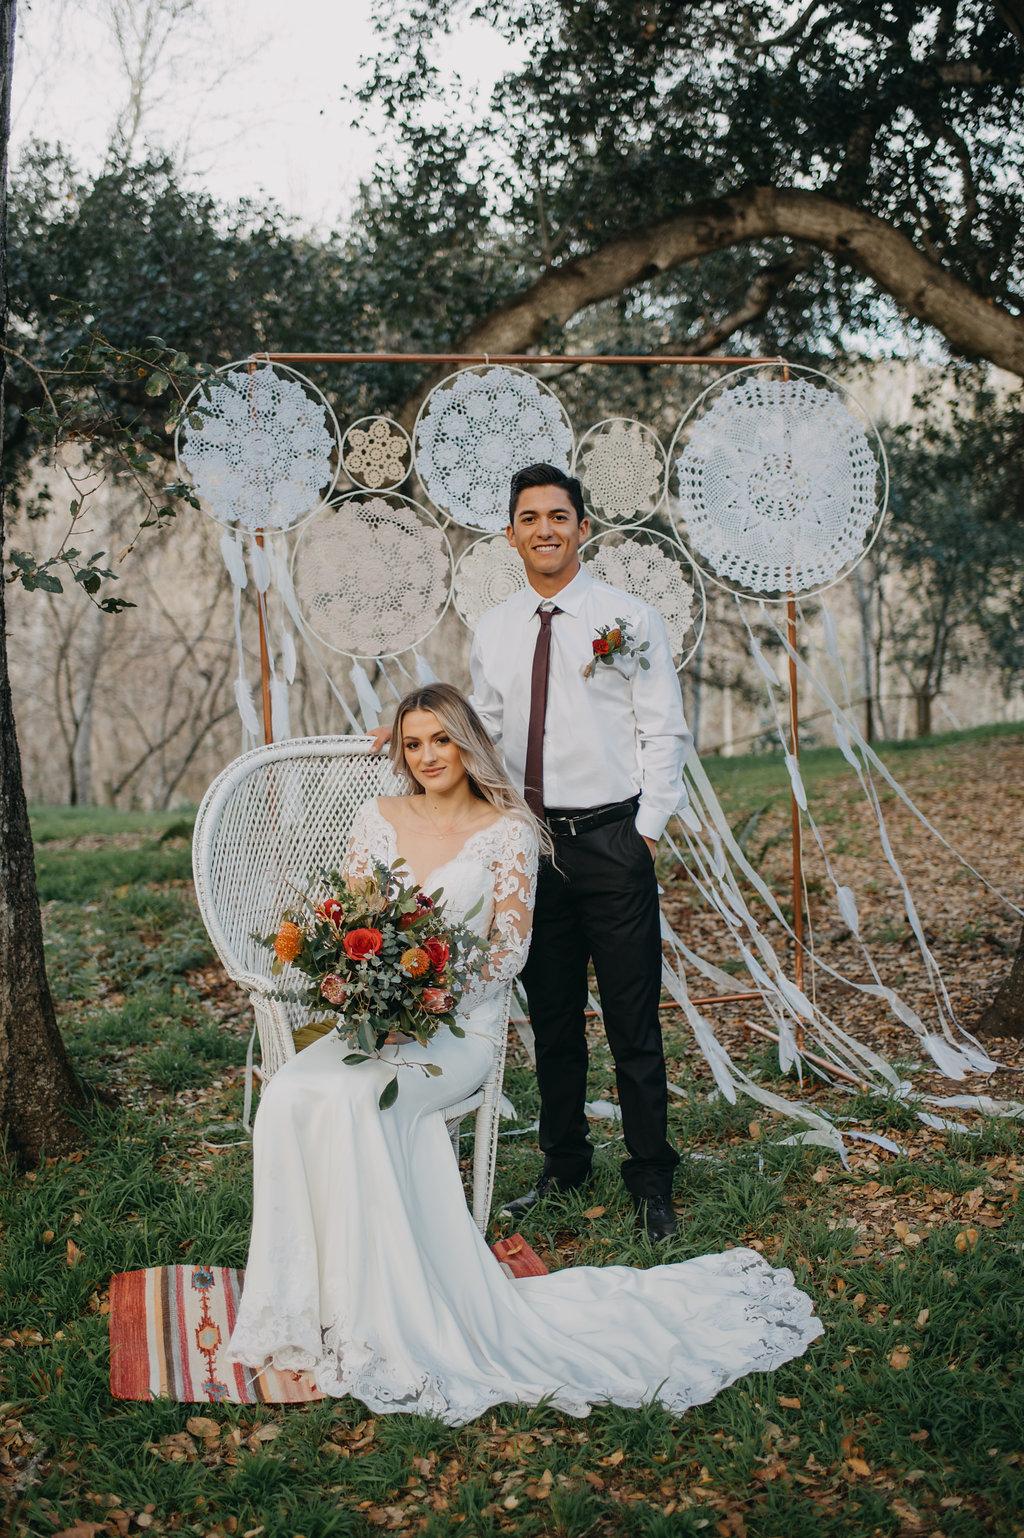 Wedding Chicks feature Boho wedding long sleeve lace wedding dress fall wedding